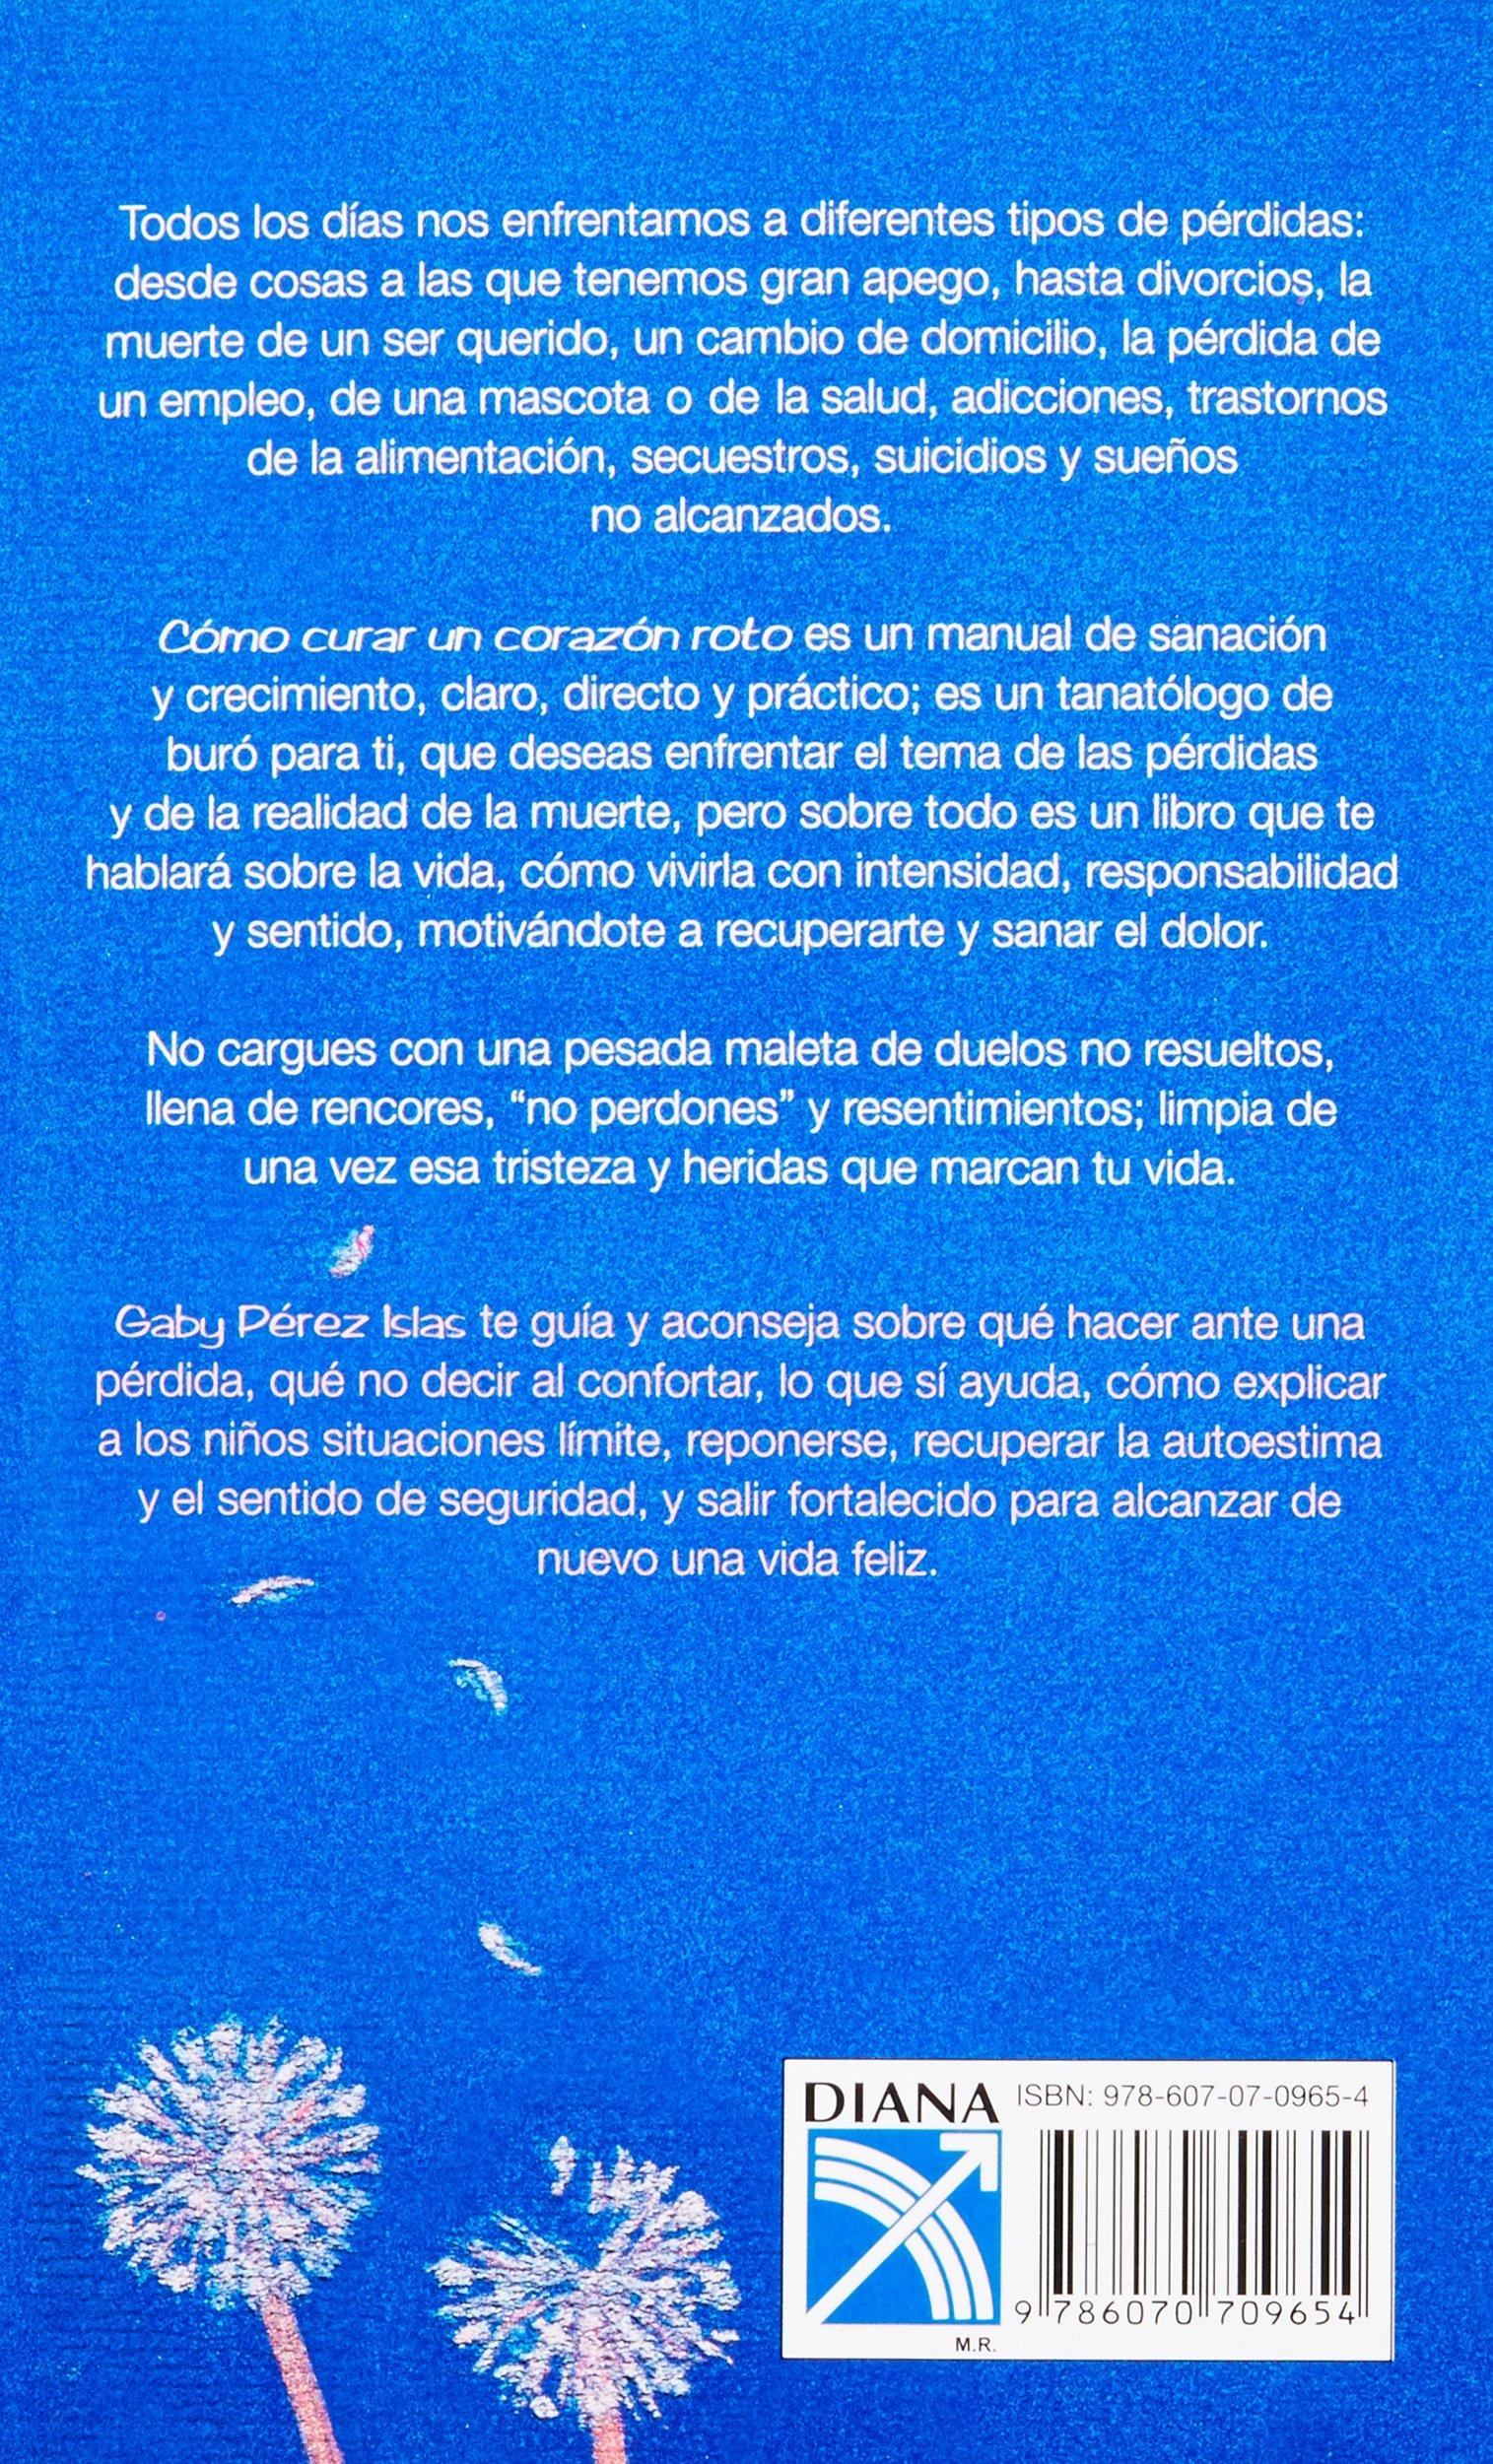 Como curar un corazón roto (Spanish Edition): Gaby Perez Islas: 9786070709654: Amazon.com: Books